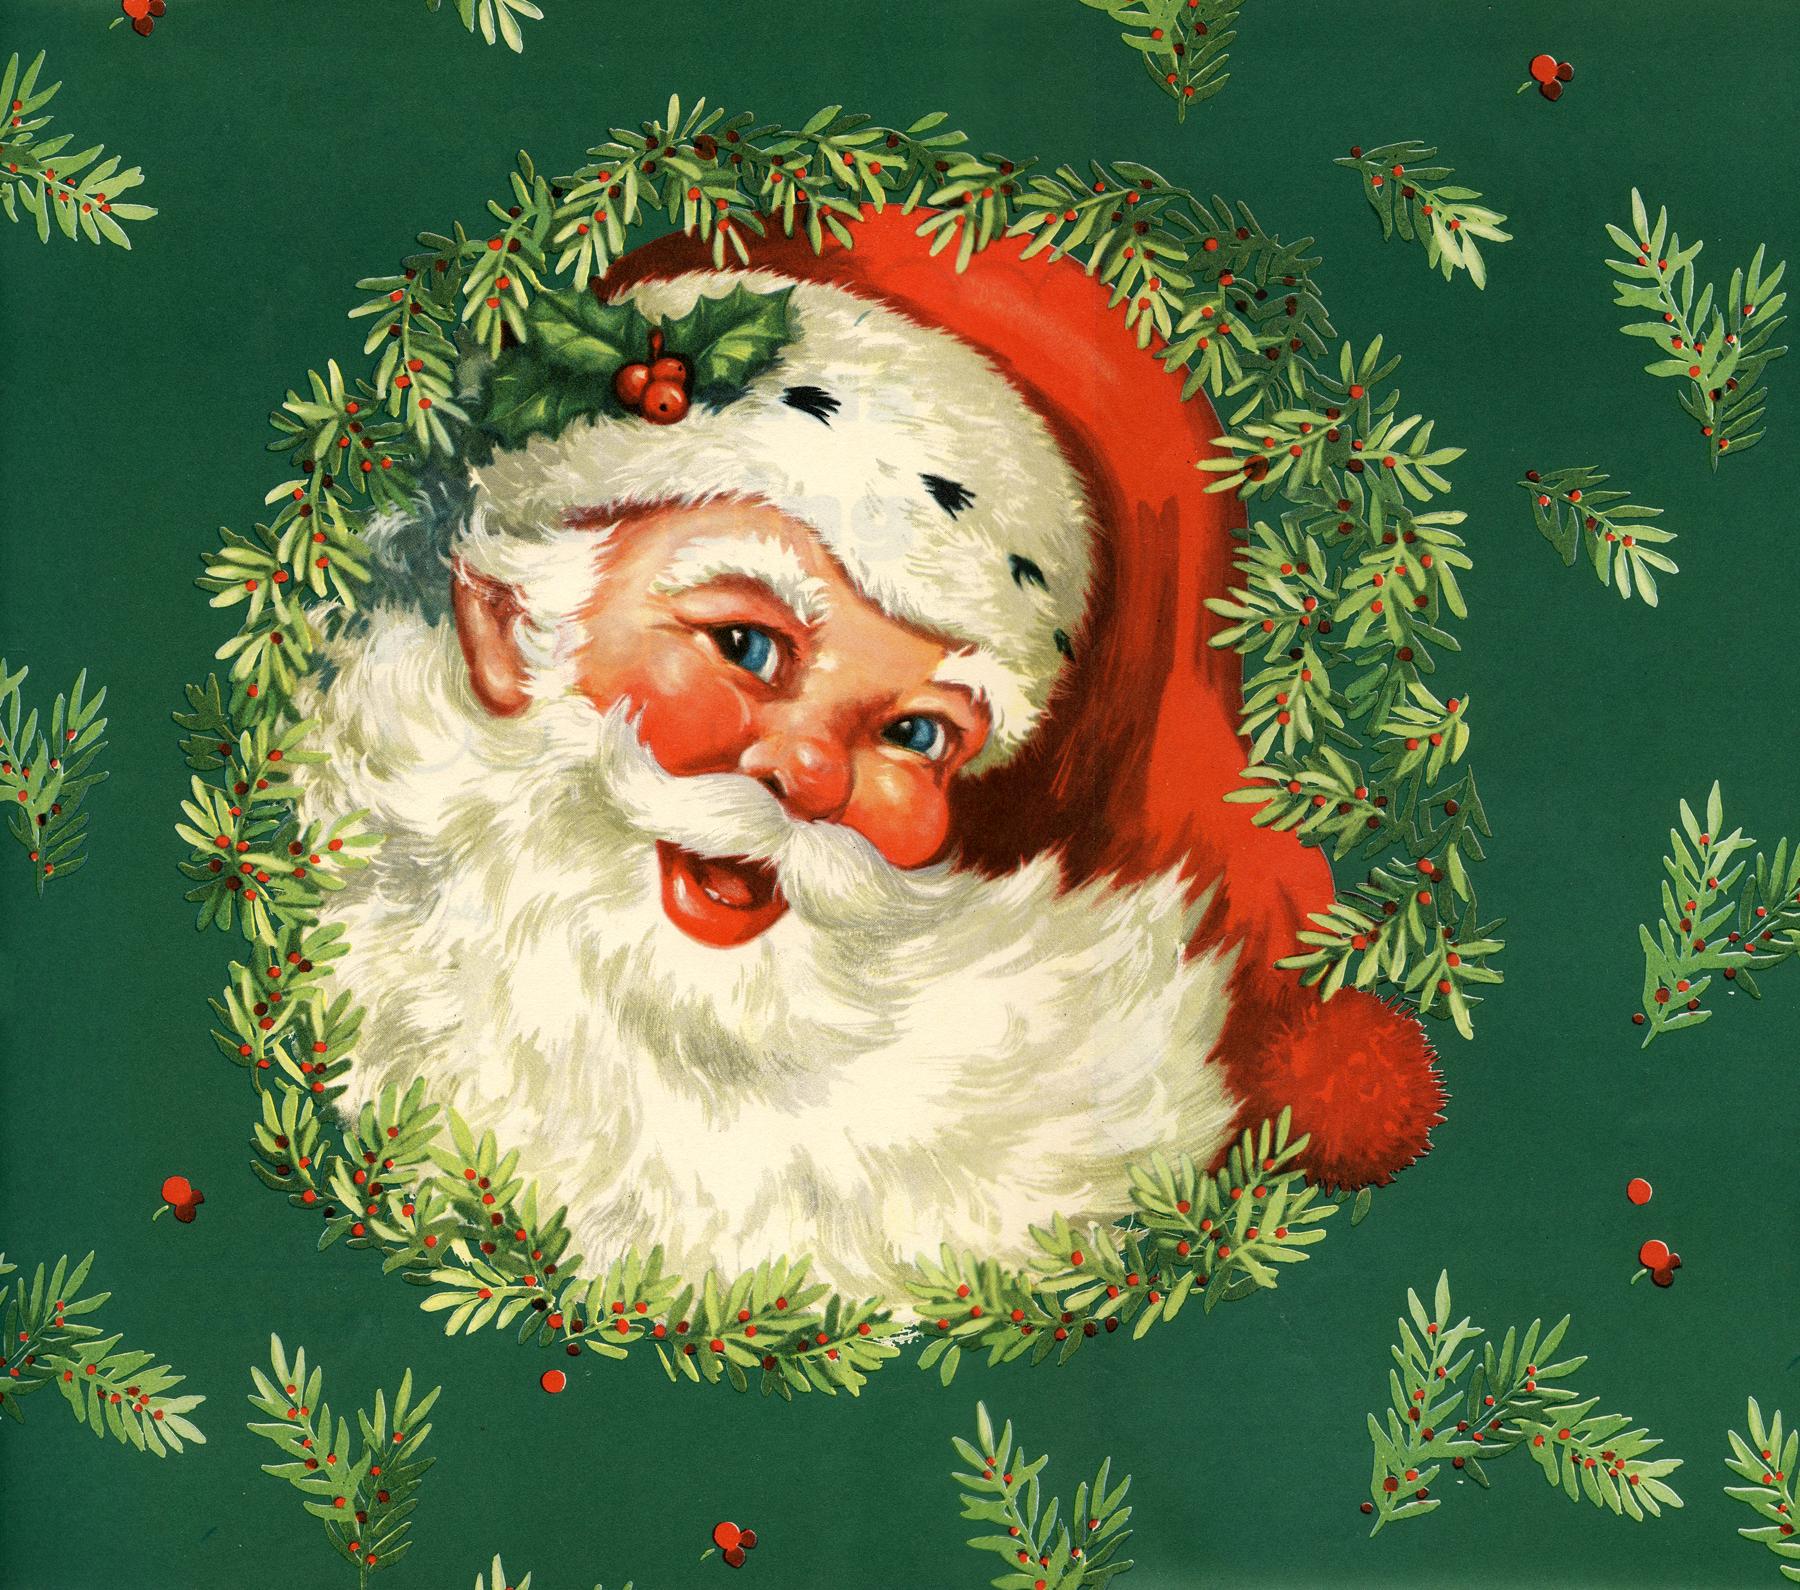 Christmas Clip Art png download - 640*480 - Free Transparent Santa Claus  png Download. - CleanPNG / KissPNG